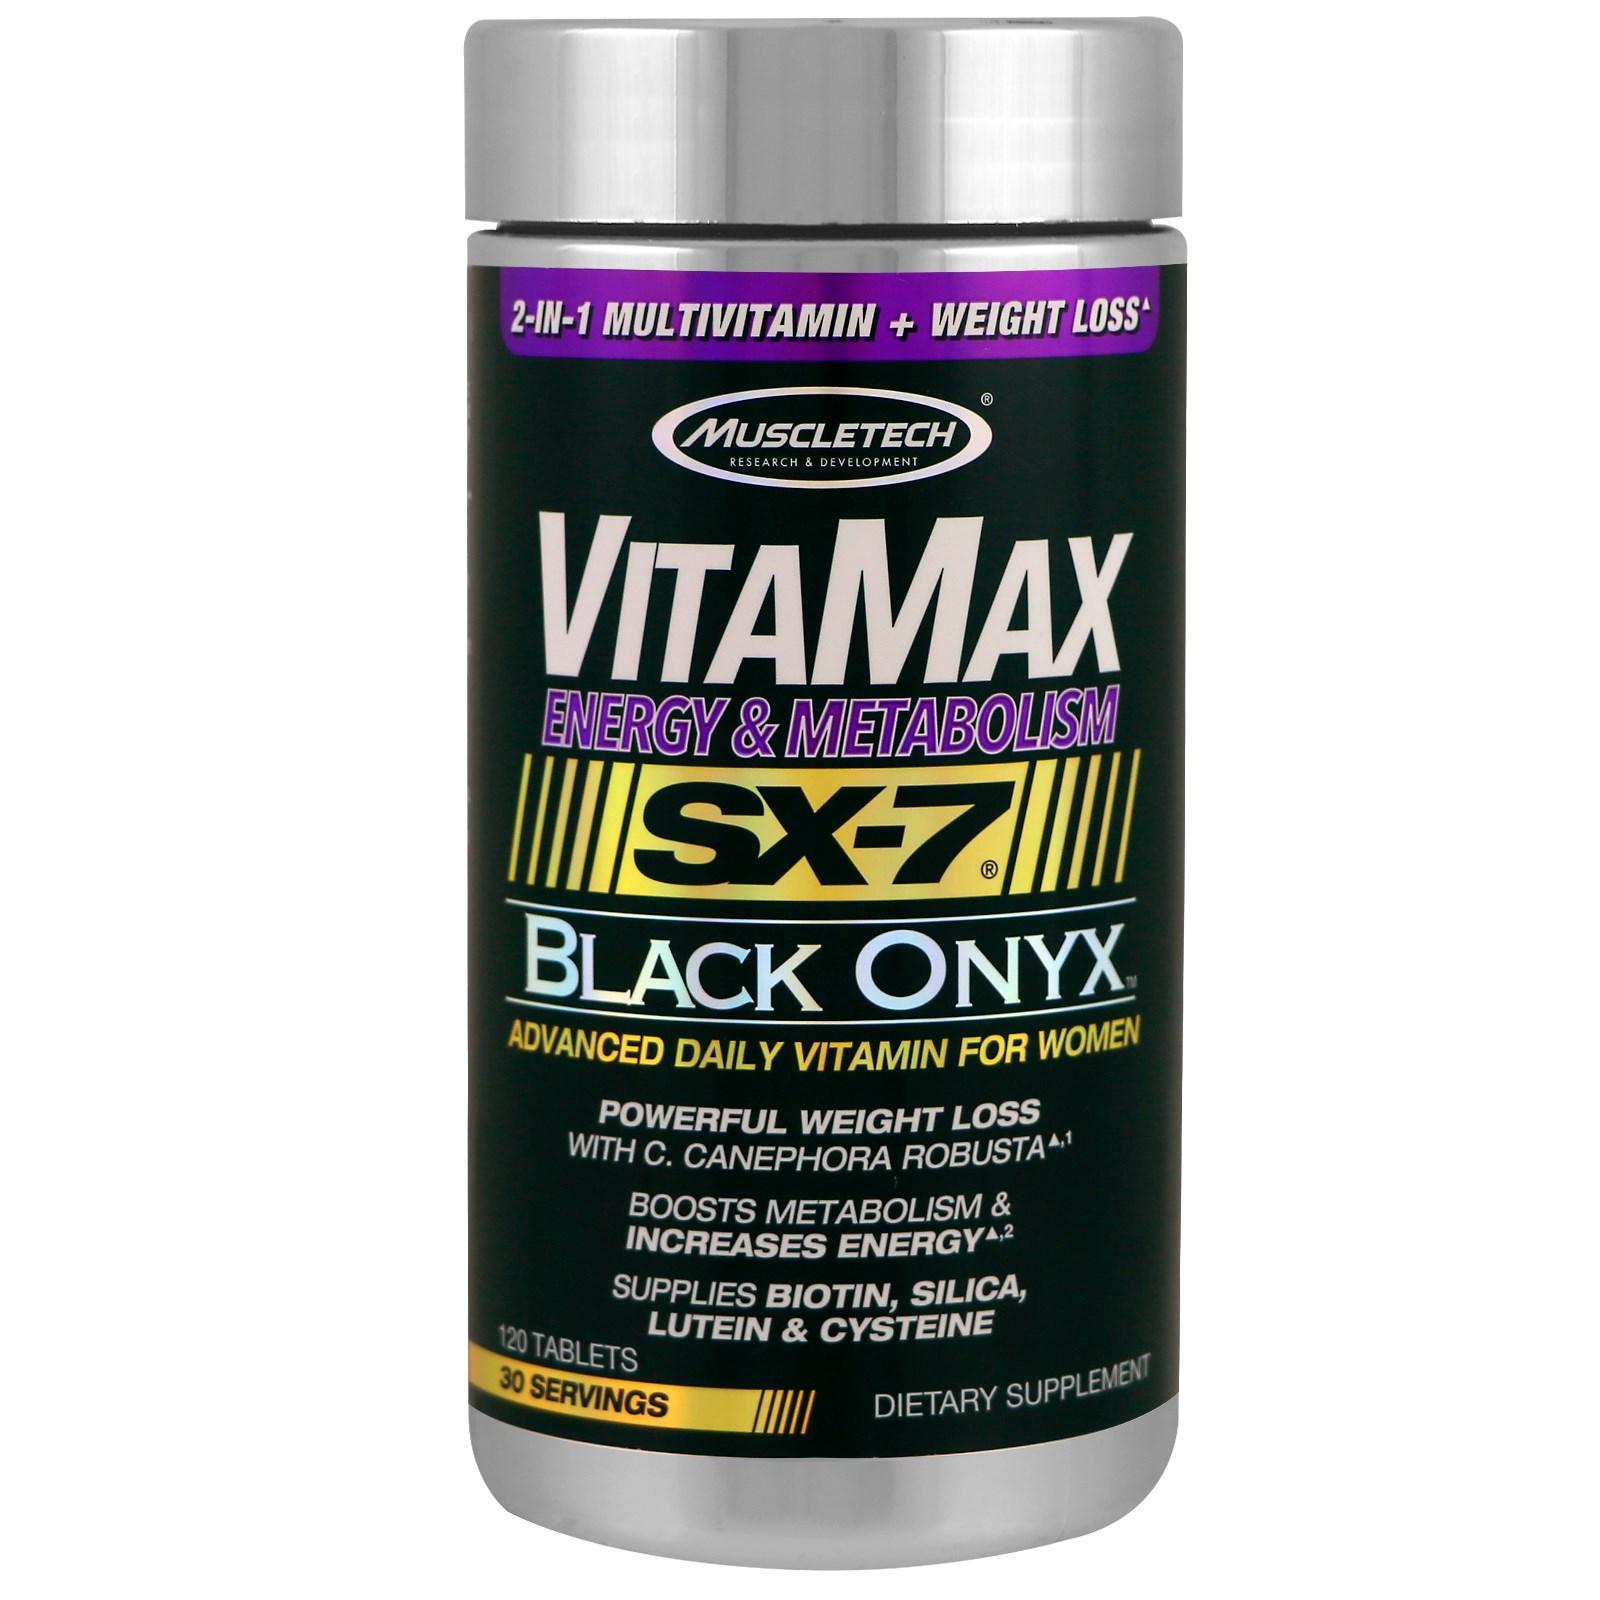 VITAMAX SPORT FOR WOMEN